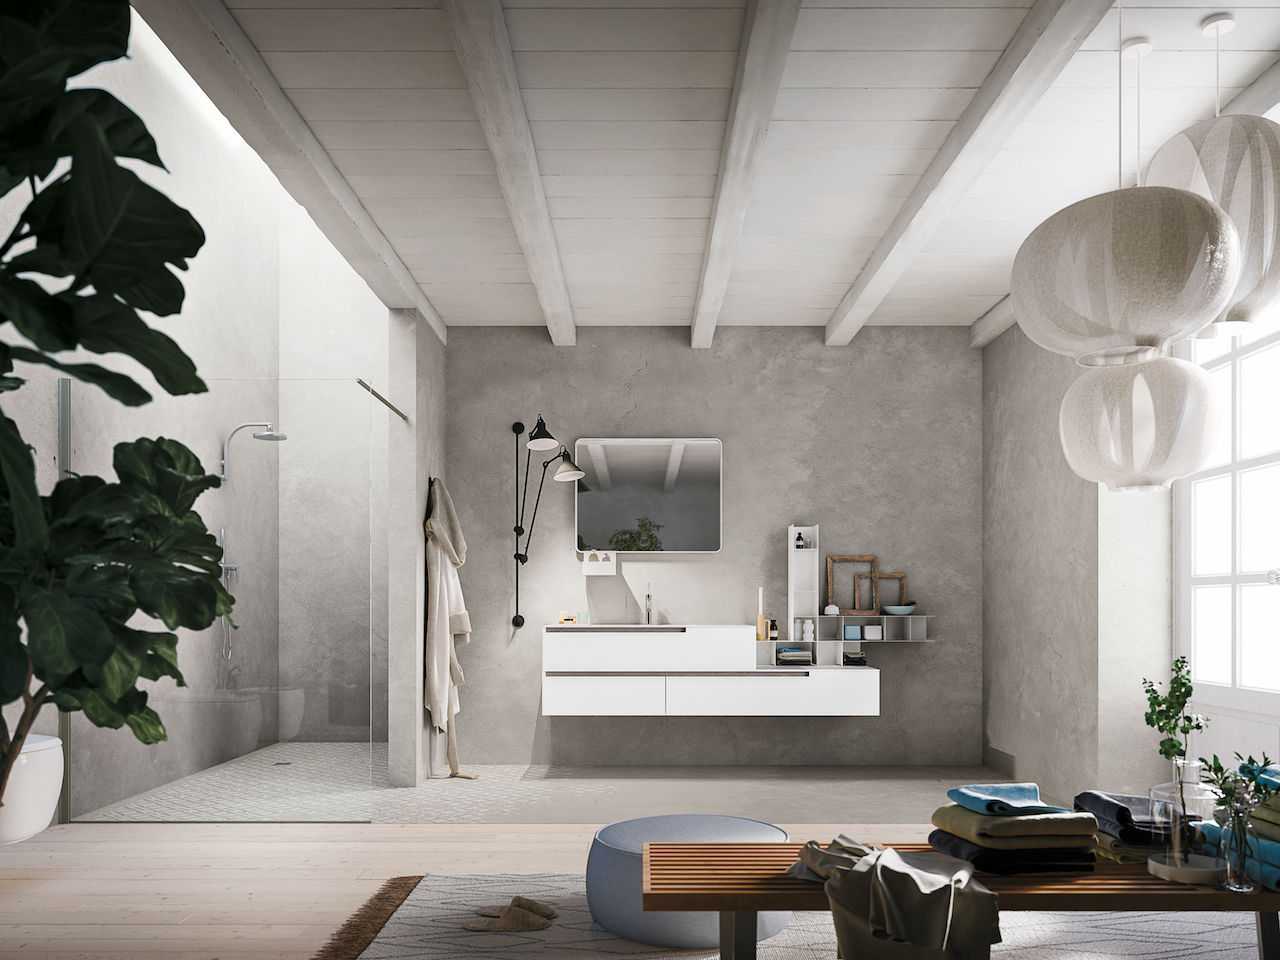 Artesi Arredo Bagno : Nuovi stili per l arredo bagno